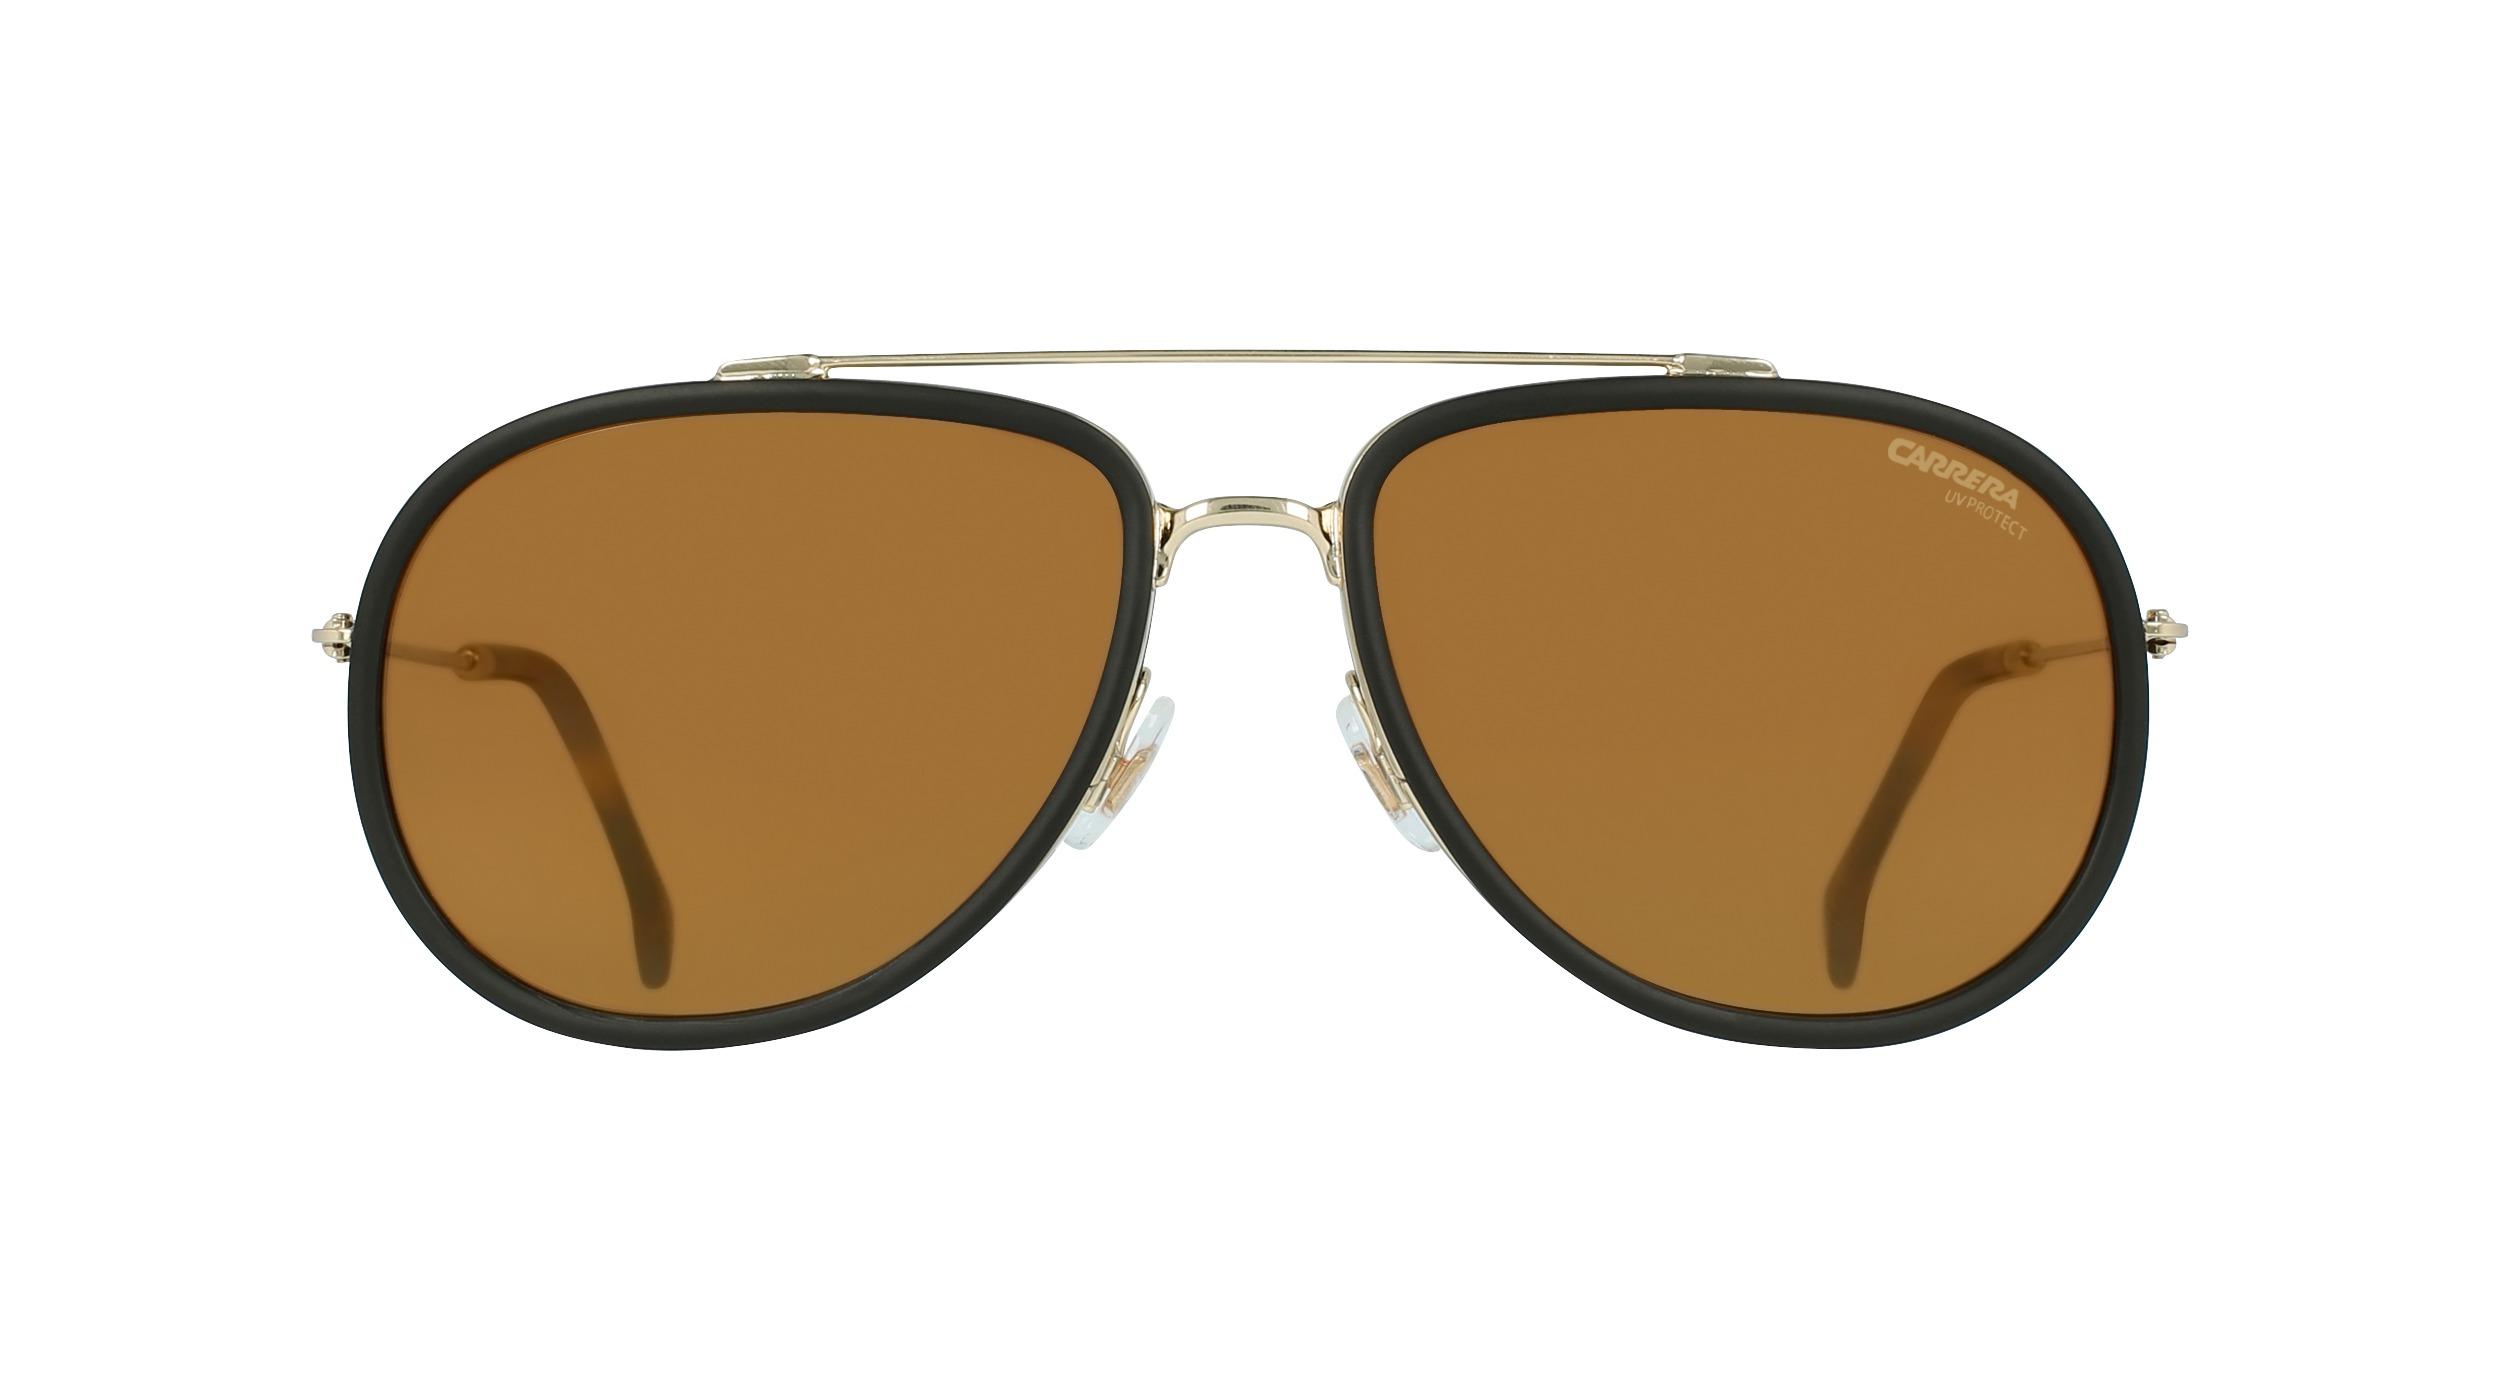 optic2000-lunettes-soleil-carrera